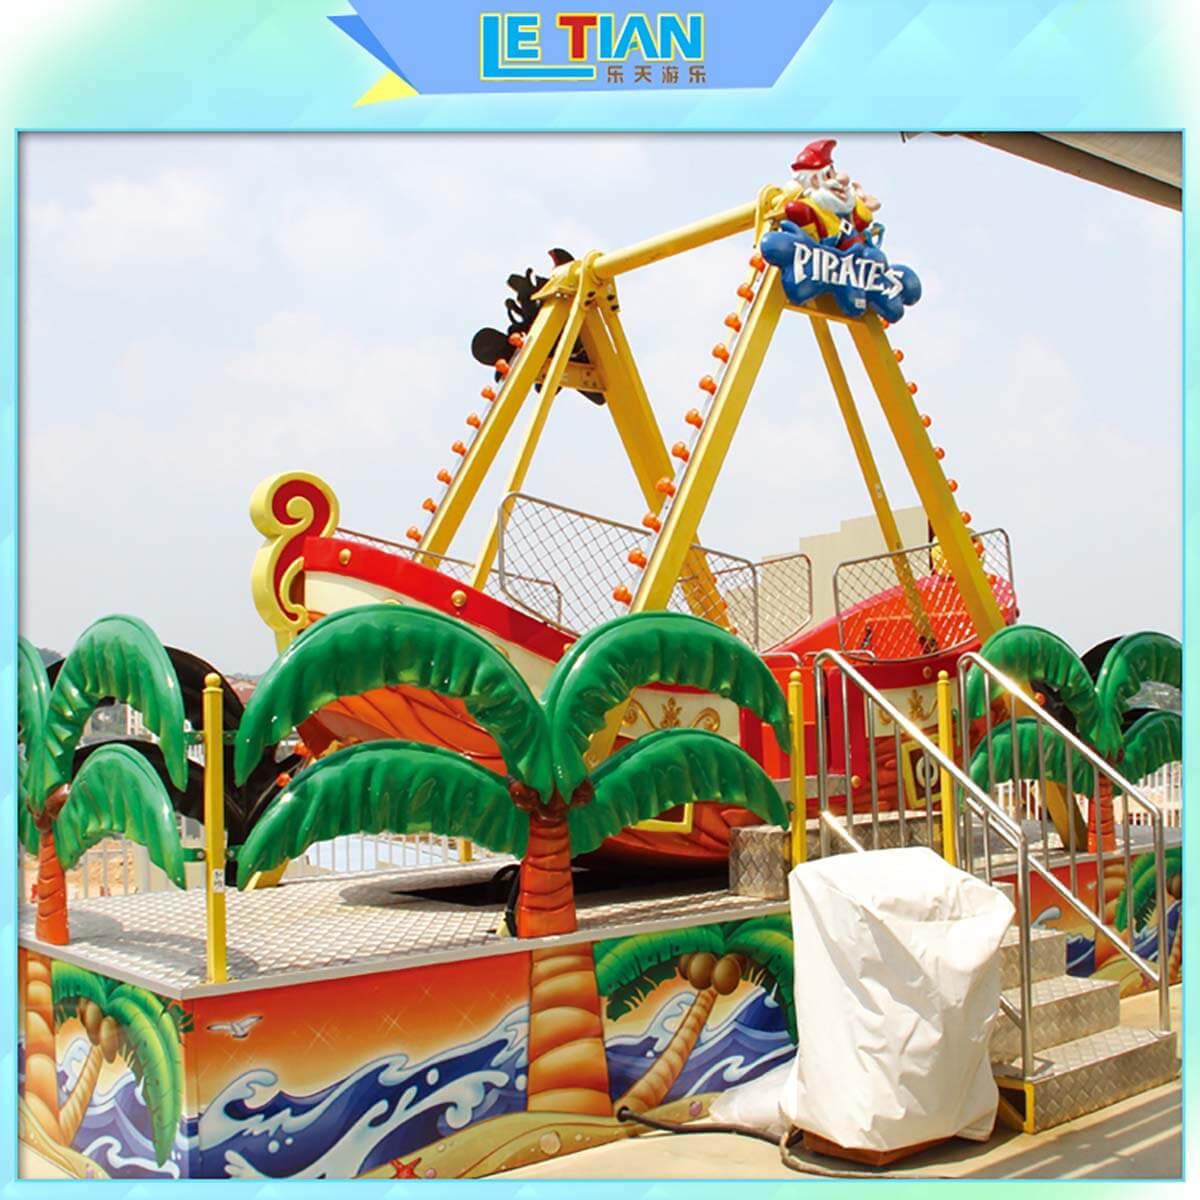 LETIAN sliding rides for kids carnival-2